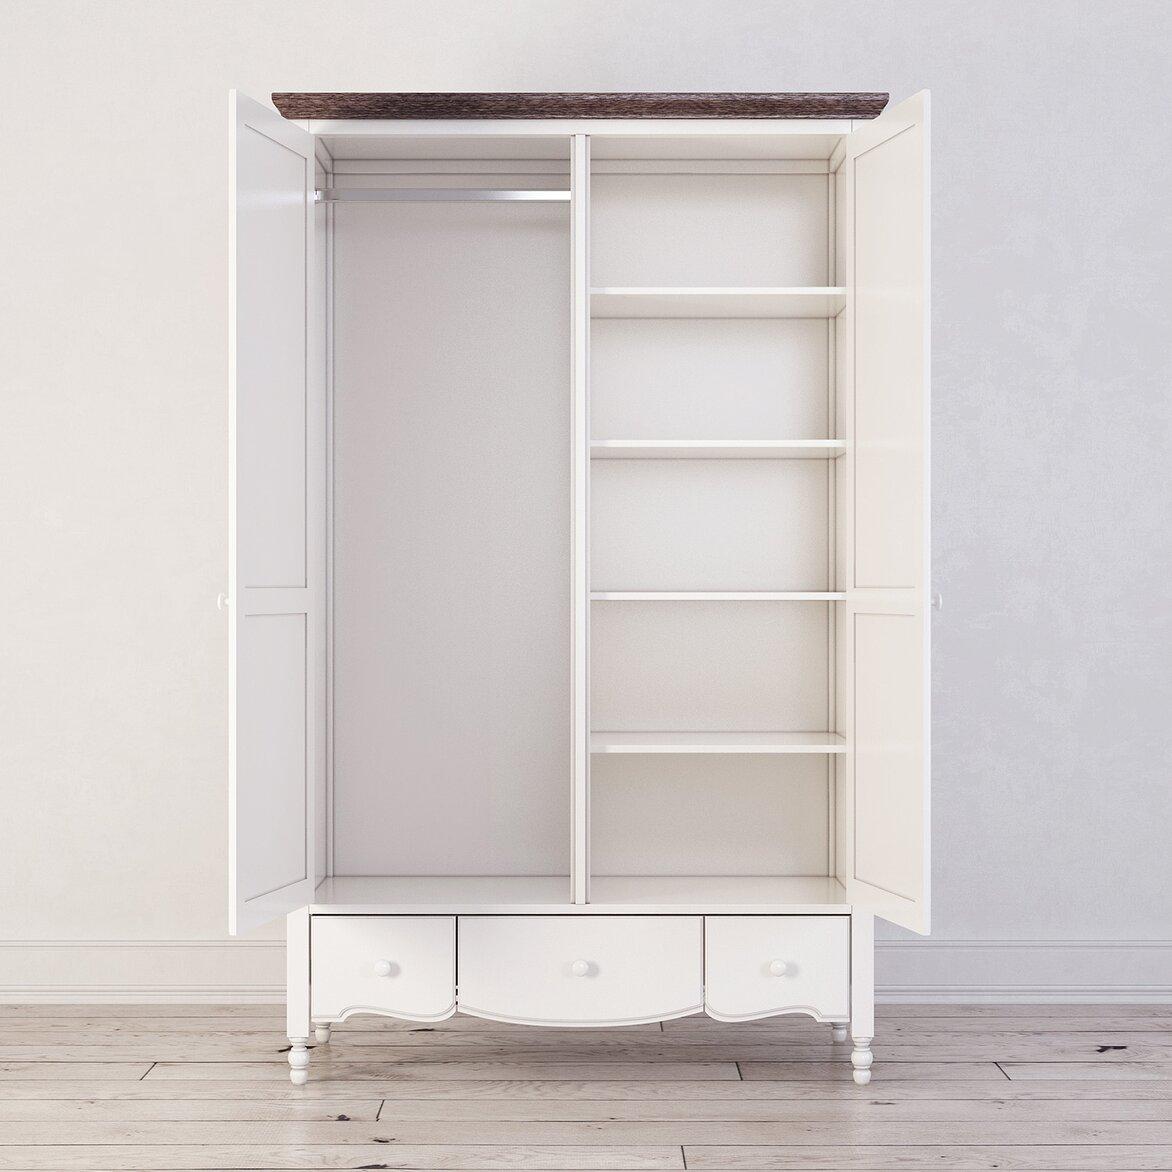 Шкаф двухстворчатый Leblanc, белый (открытый)